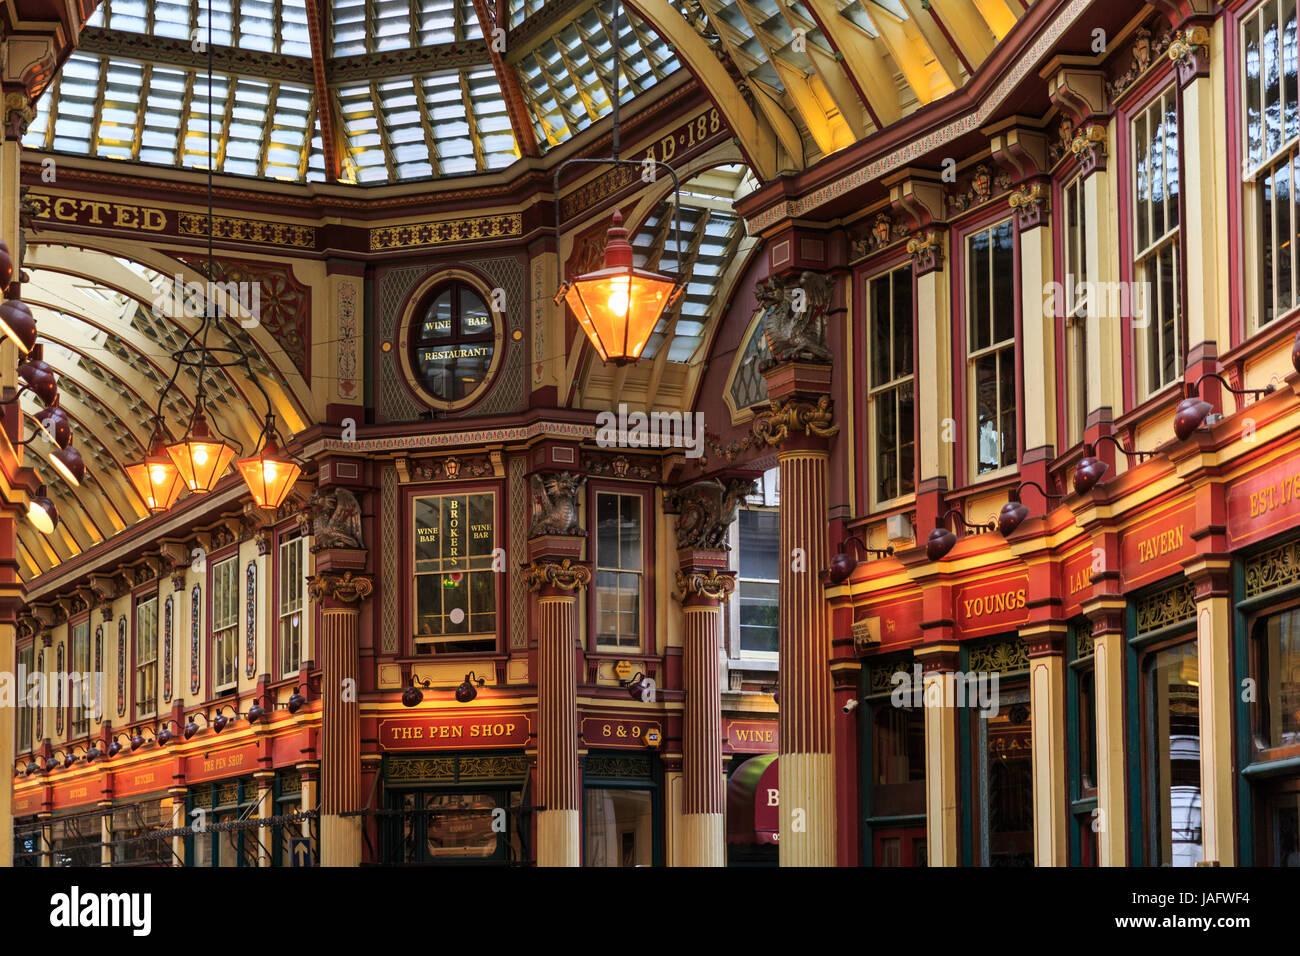 Die historischen Leadenhall Markt, innen Arkaden, City of London, London, UK Stockbild